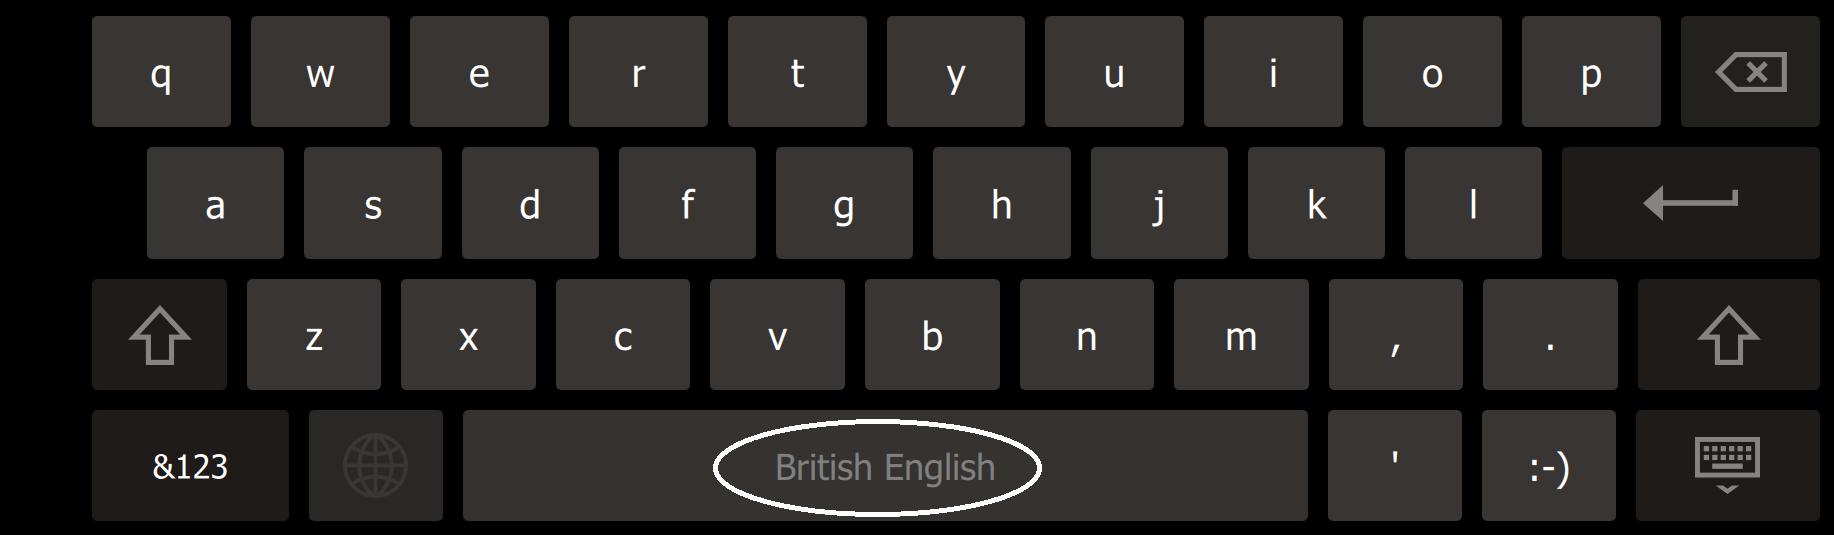 0_1514541906151_keyboard_error.png